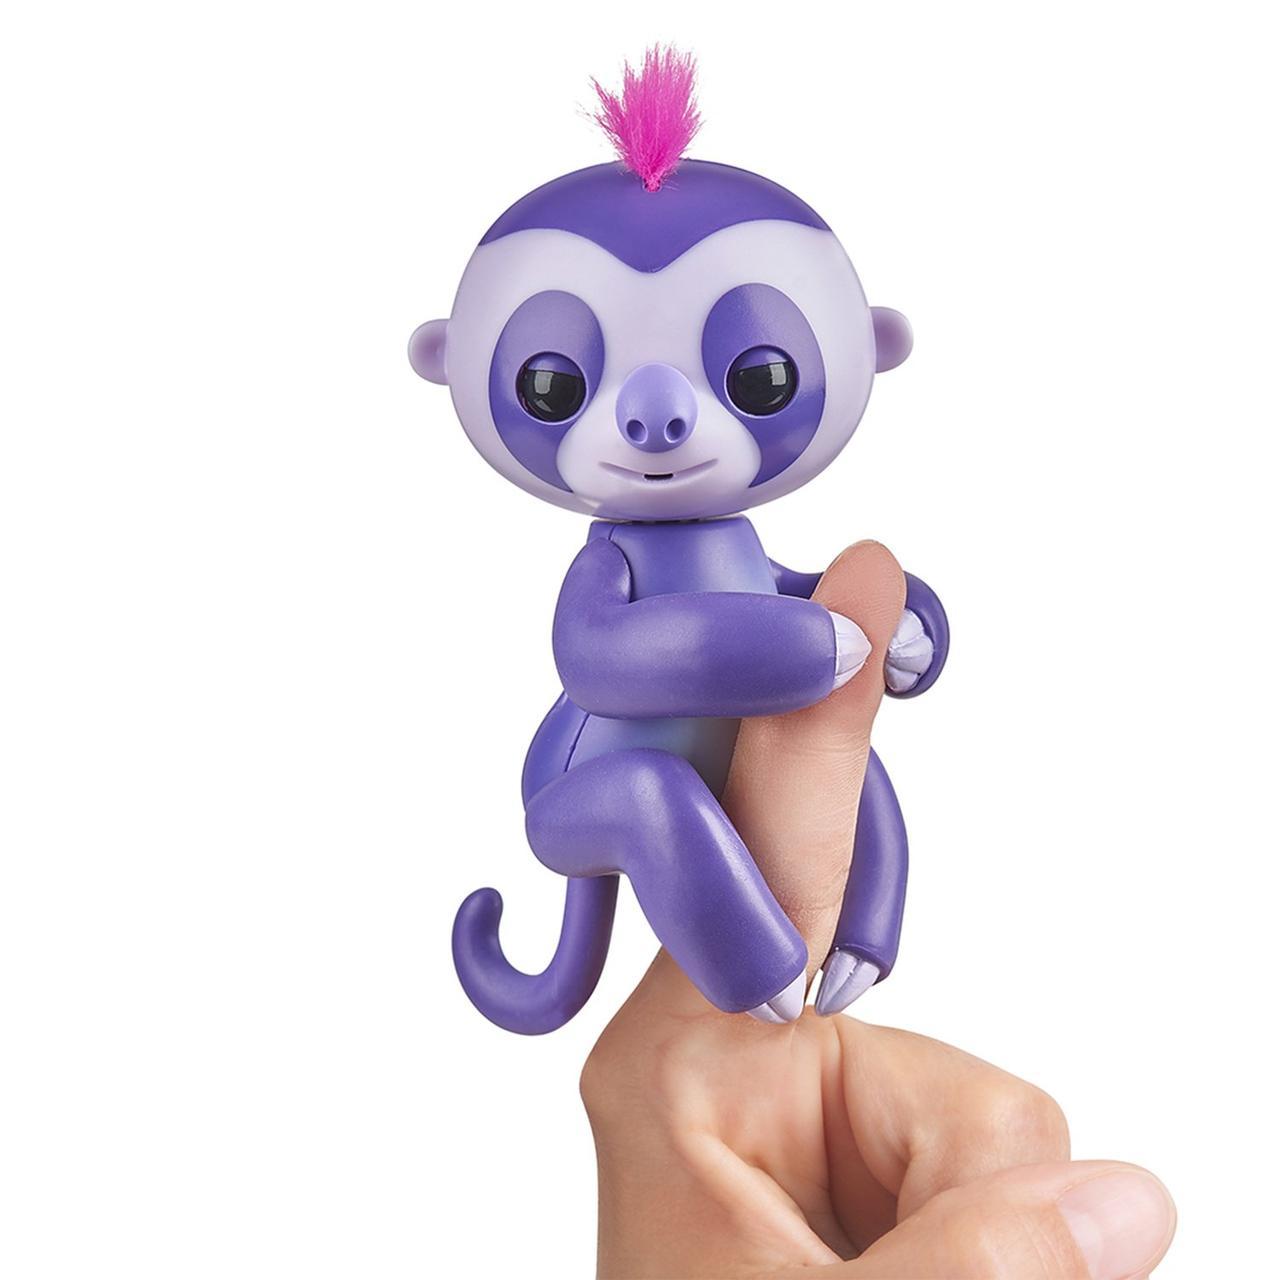 Интерактивный ленивец WowWee Fingerlings